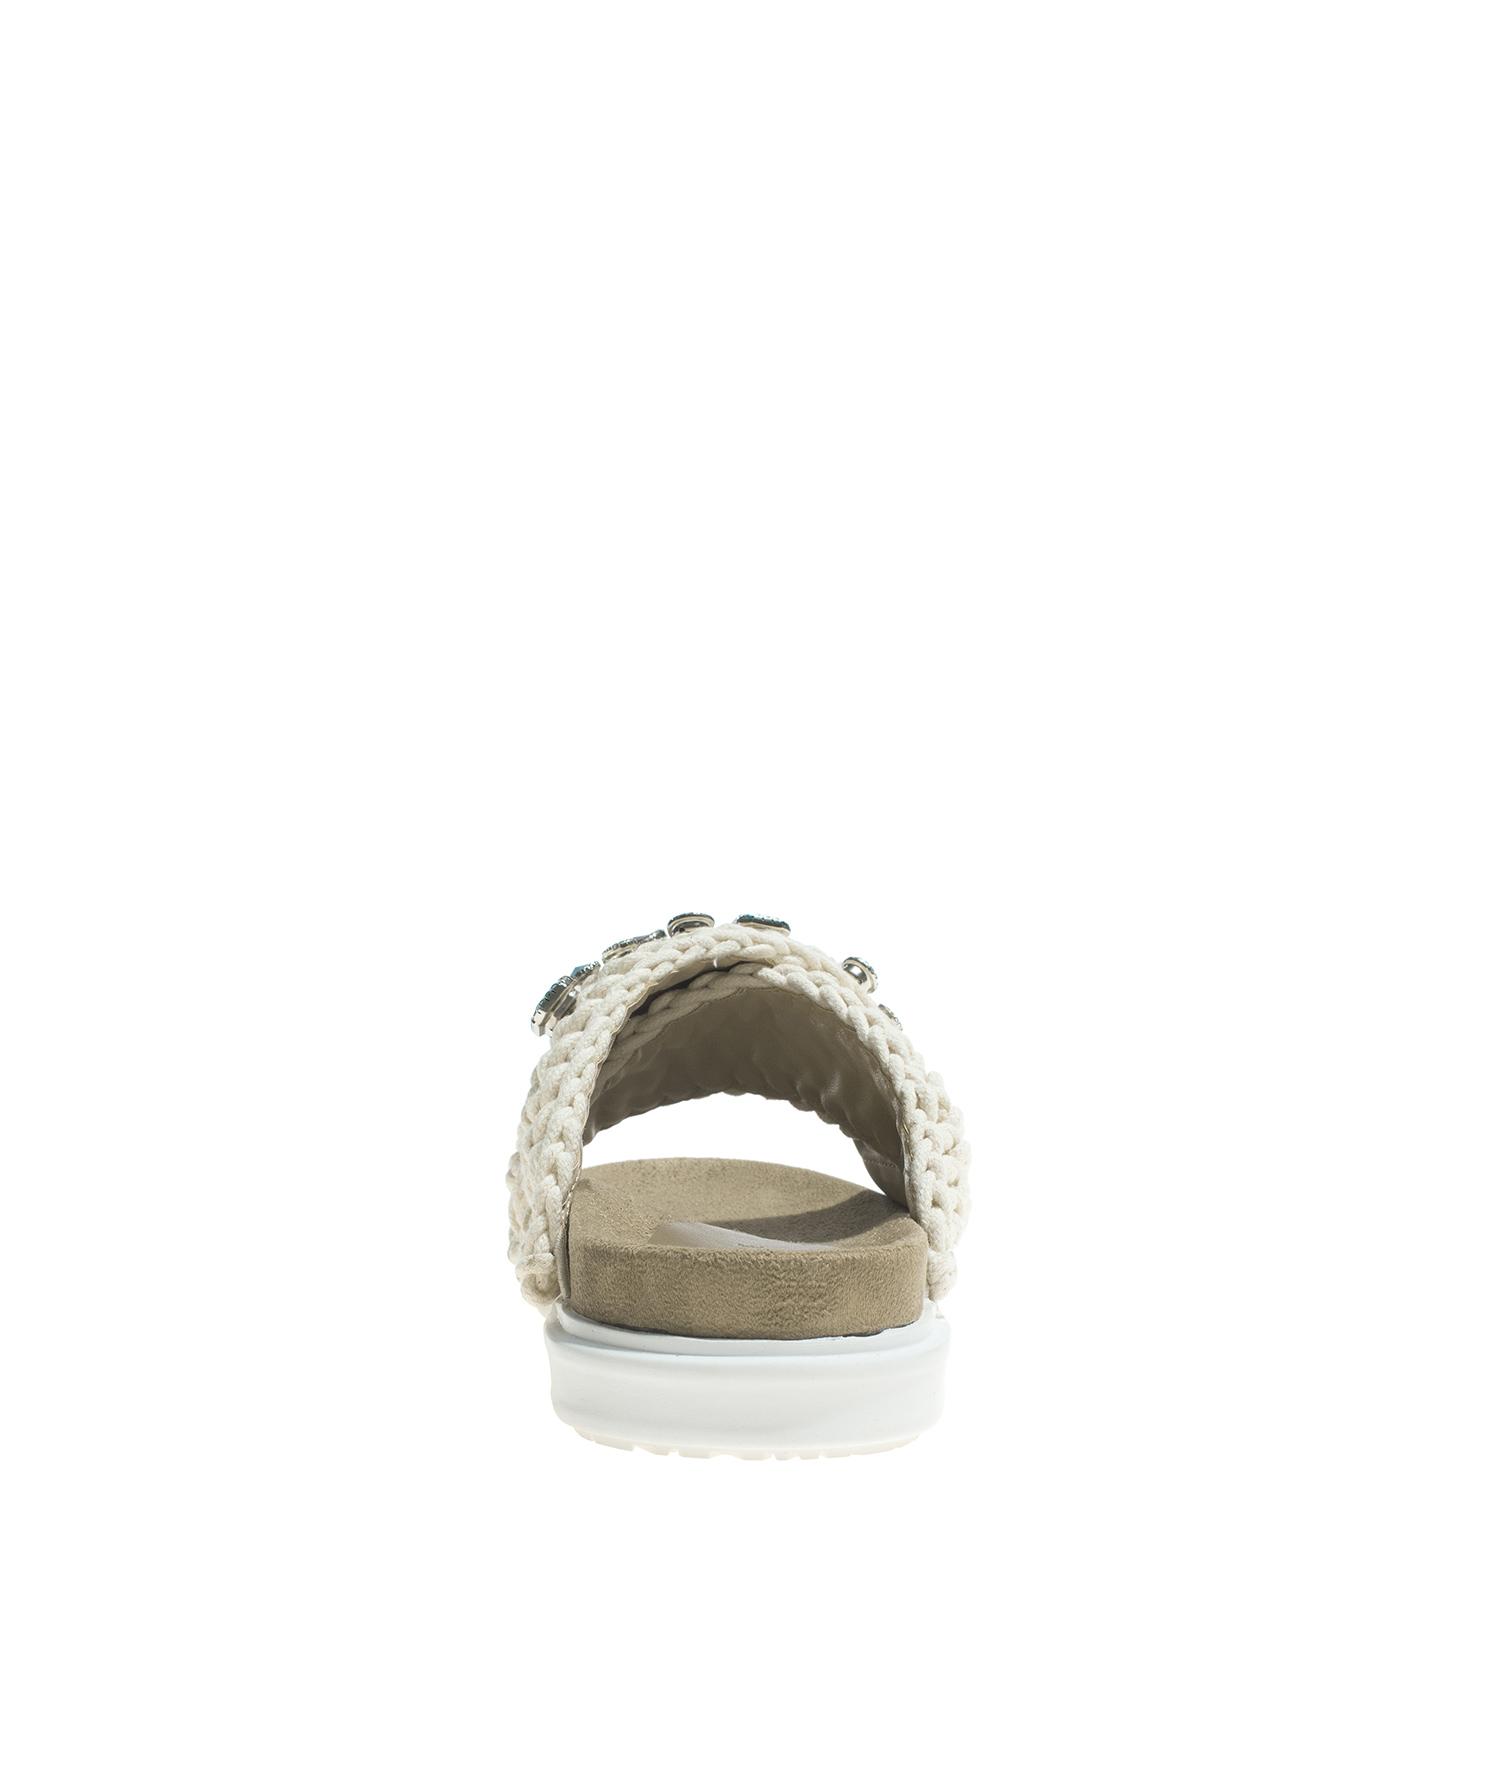 5baba3555df AnnaKastle Womens Chunky Knit Criss Cross Slide Sandals Beige